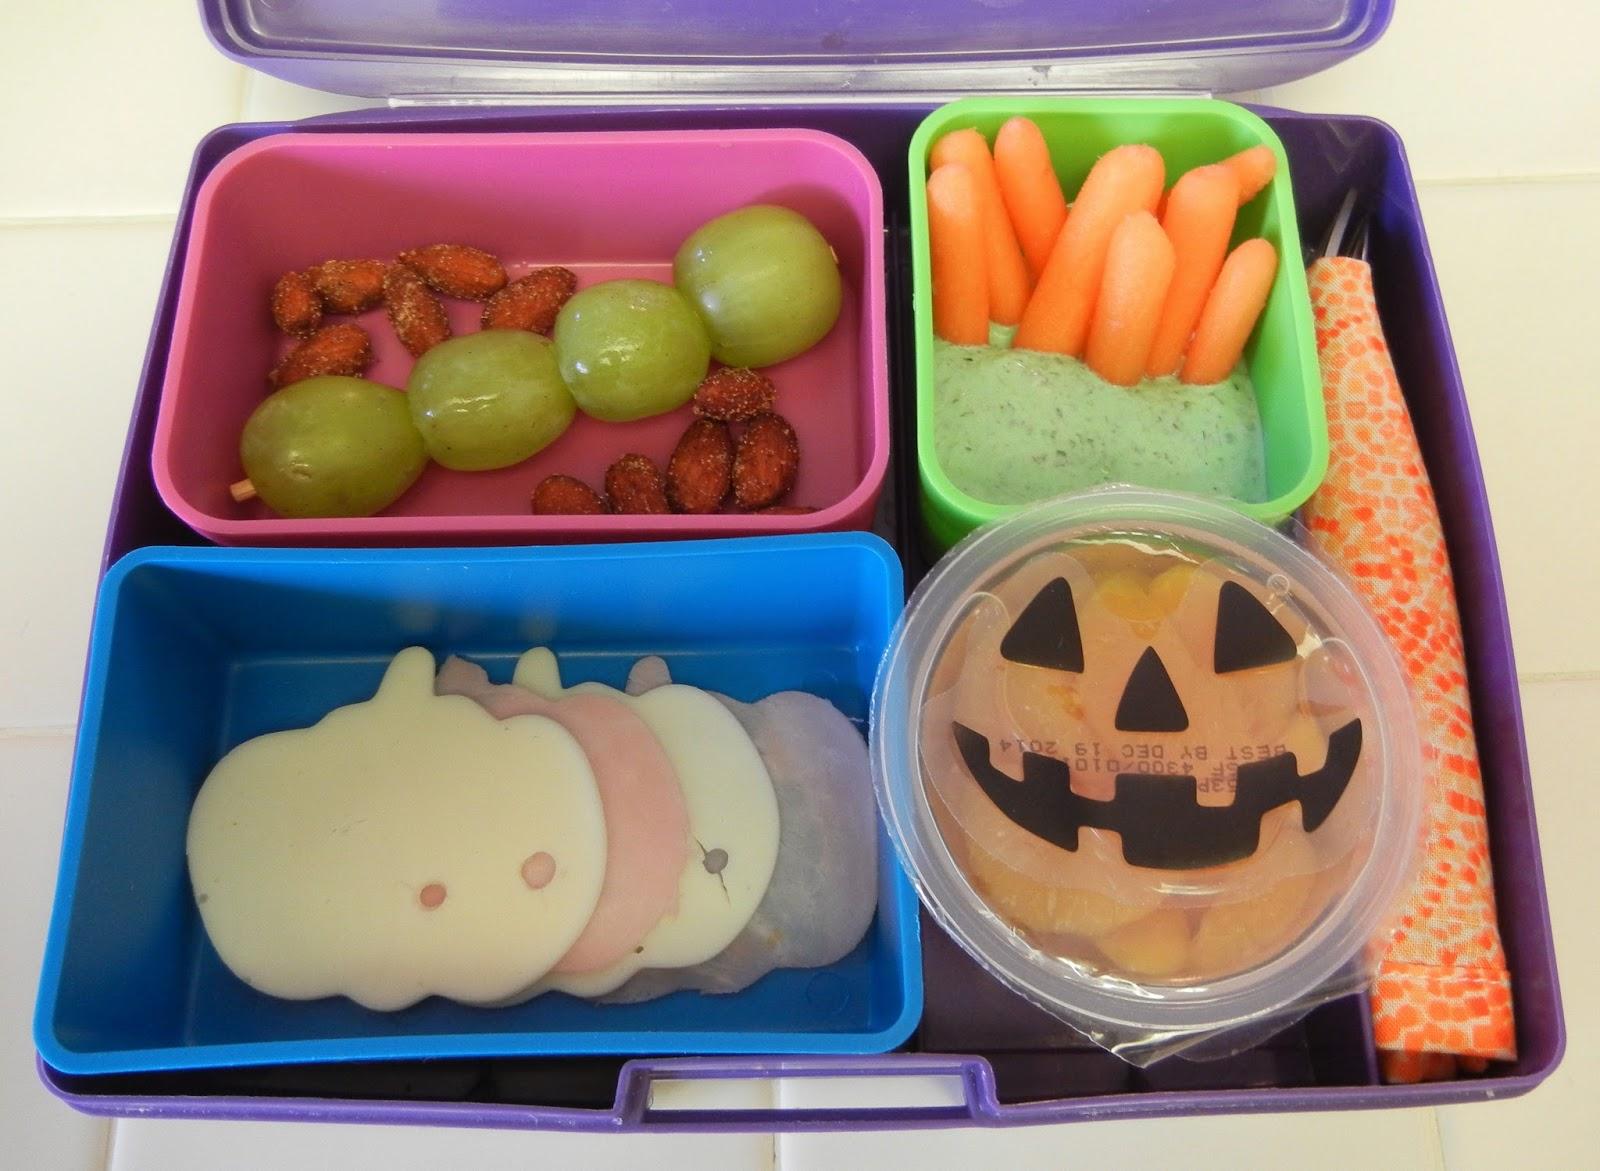 Eggface%2BHalloween%2BBento%2BBox%2BLunch%2B2014 Weight Loss Recipes Happy Halloween Trick or Treats